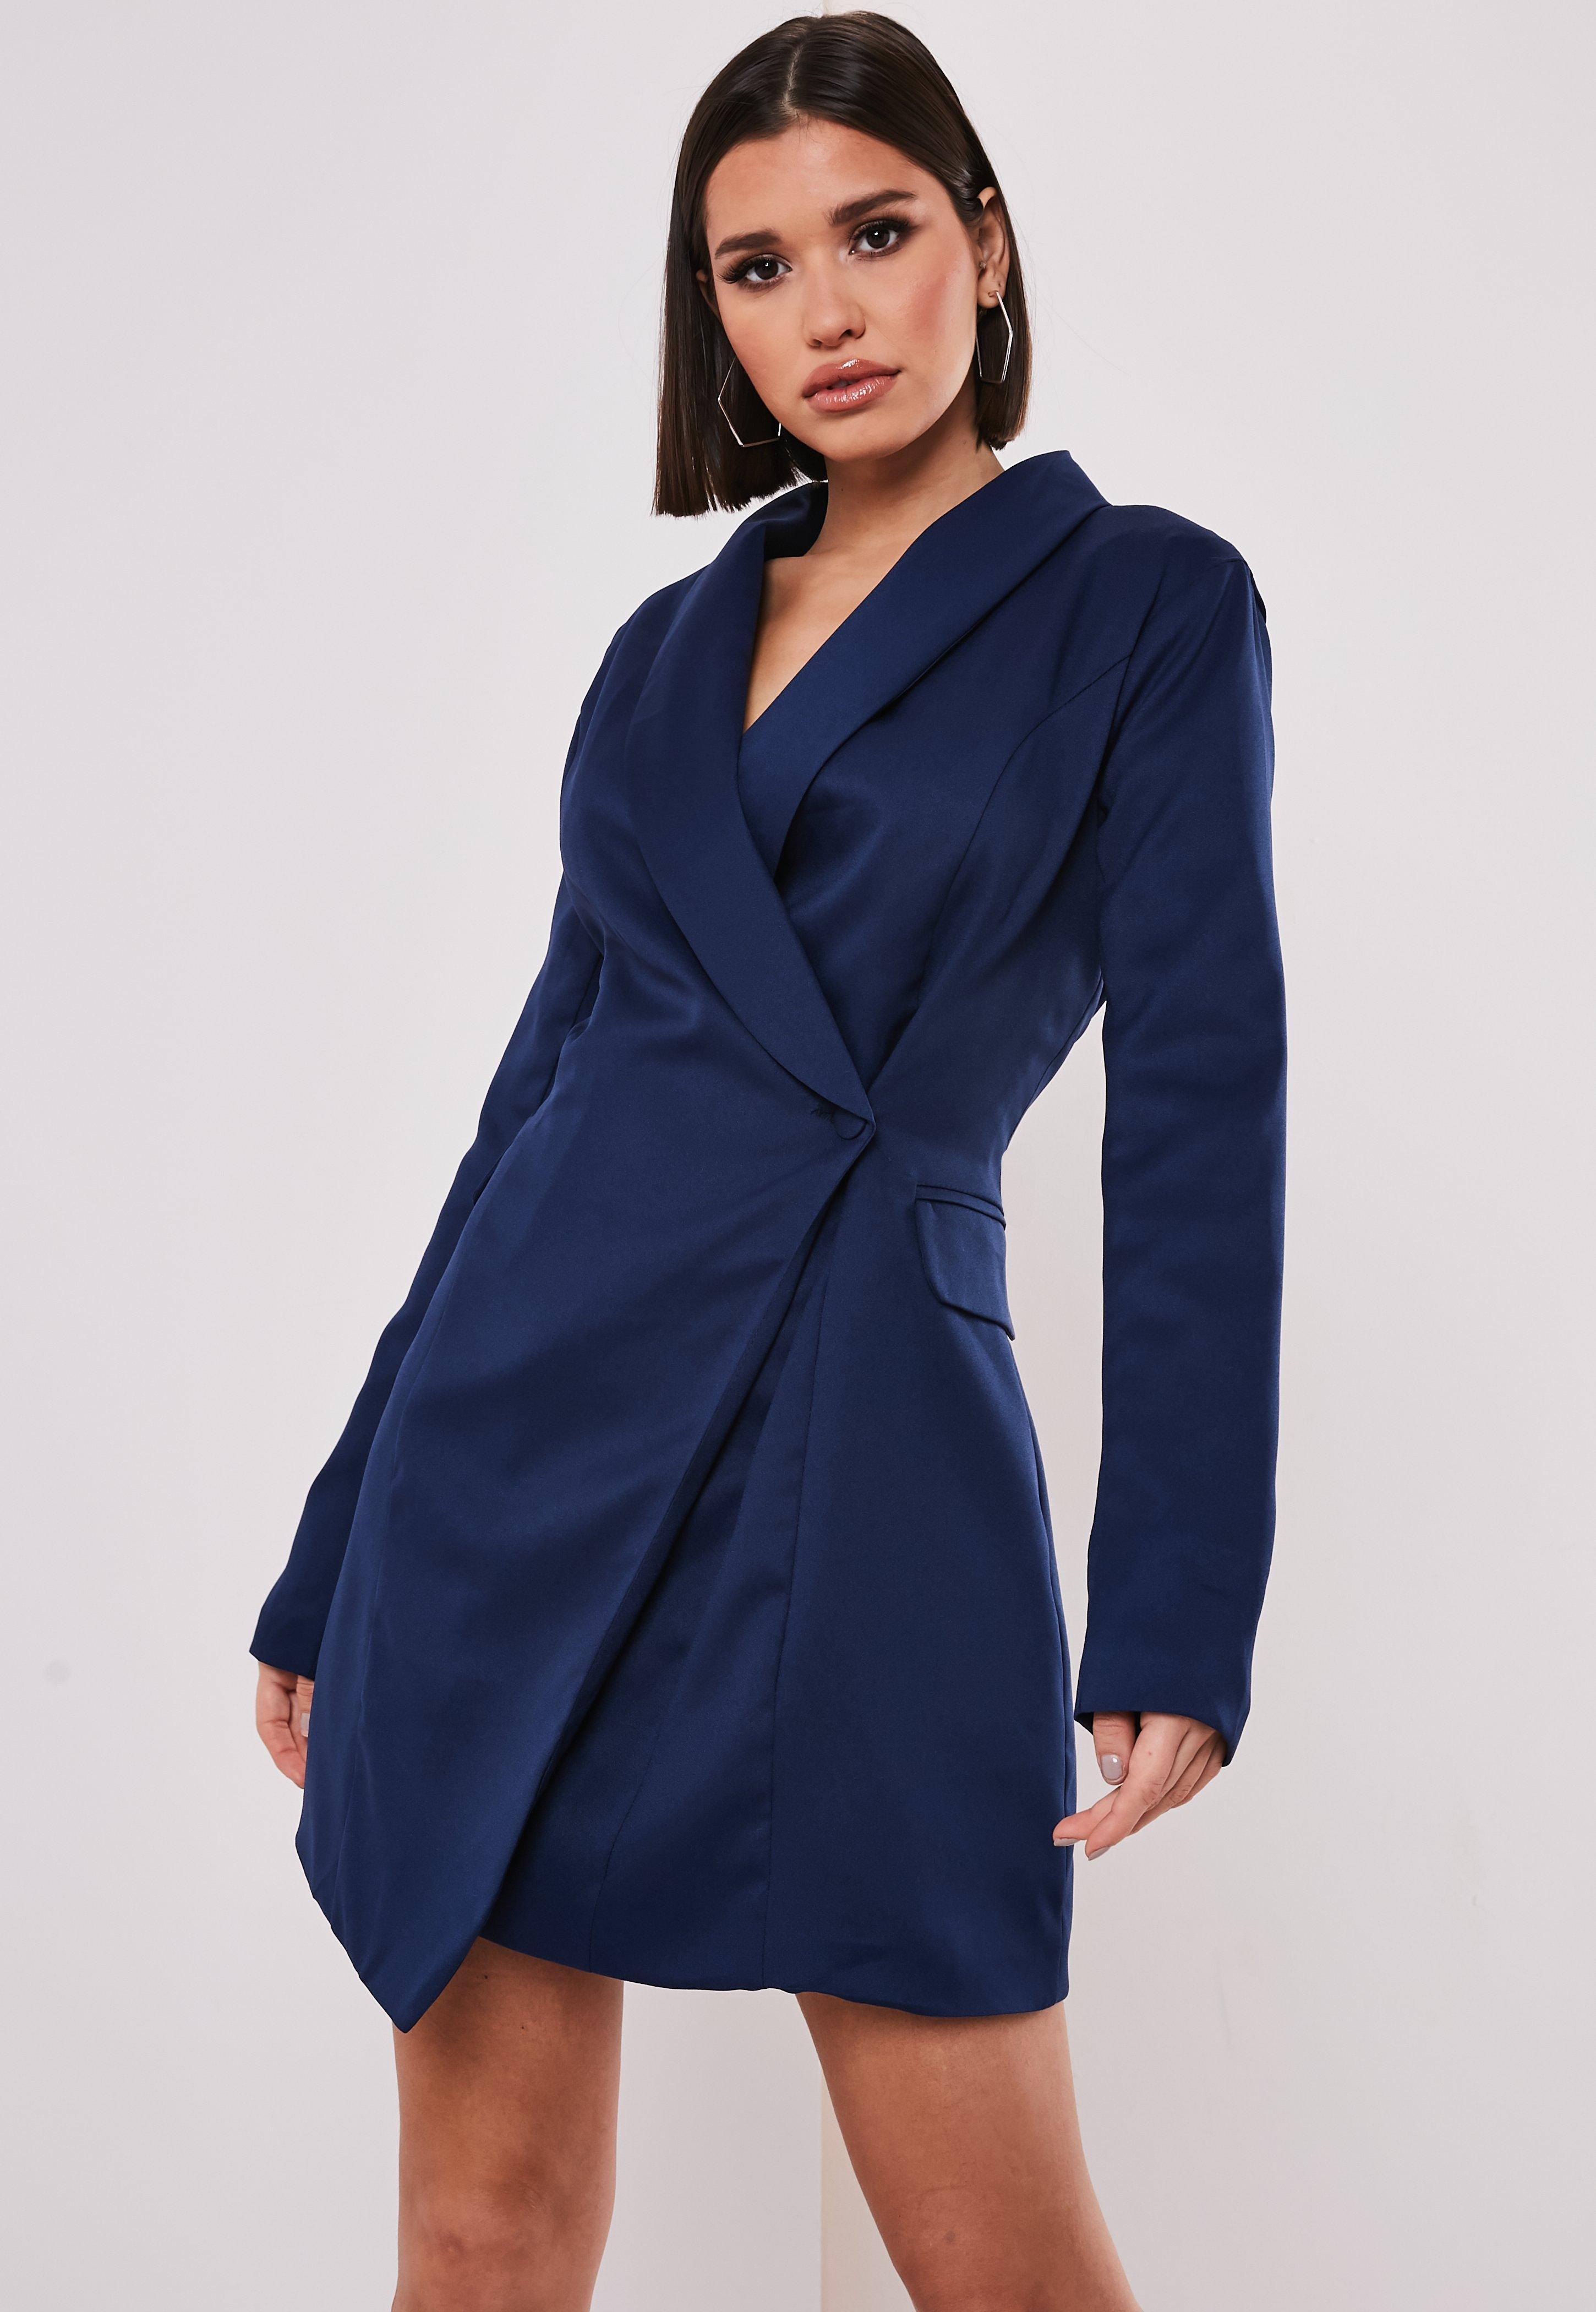 new styles a3fea 11e15 Blazer Dresses   Women s Tux Dresses - Missguided